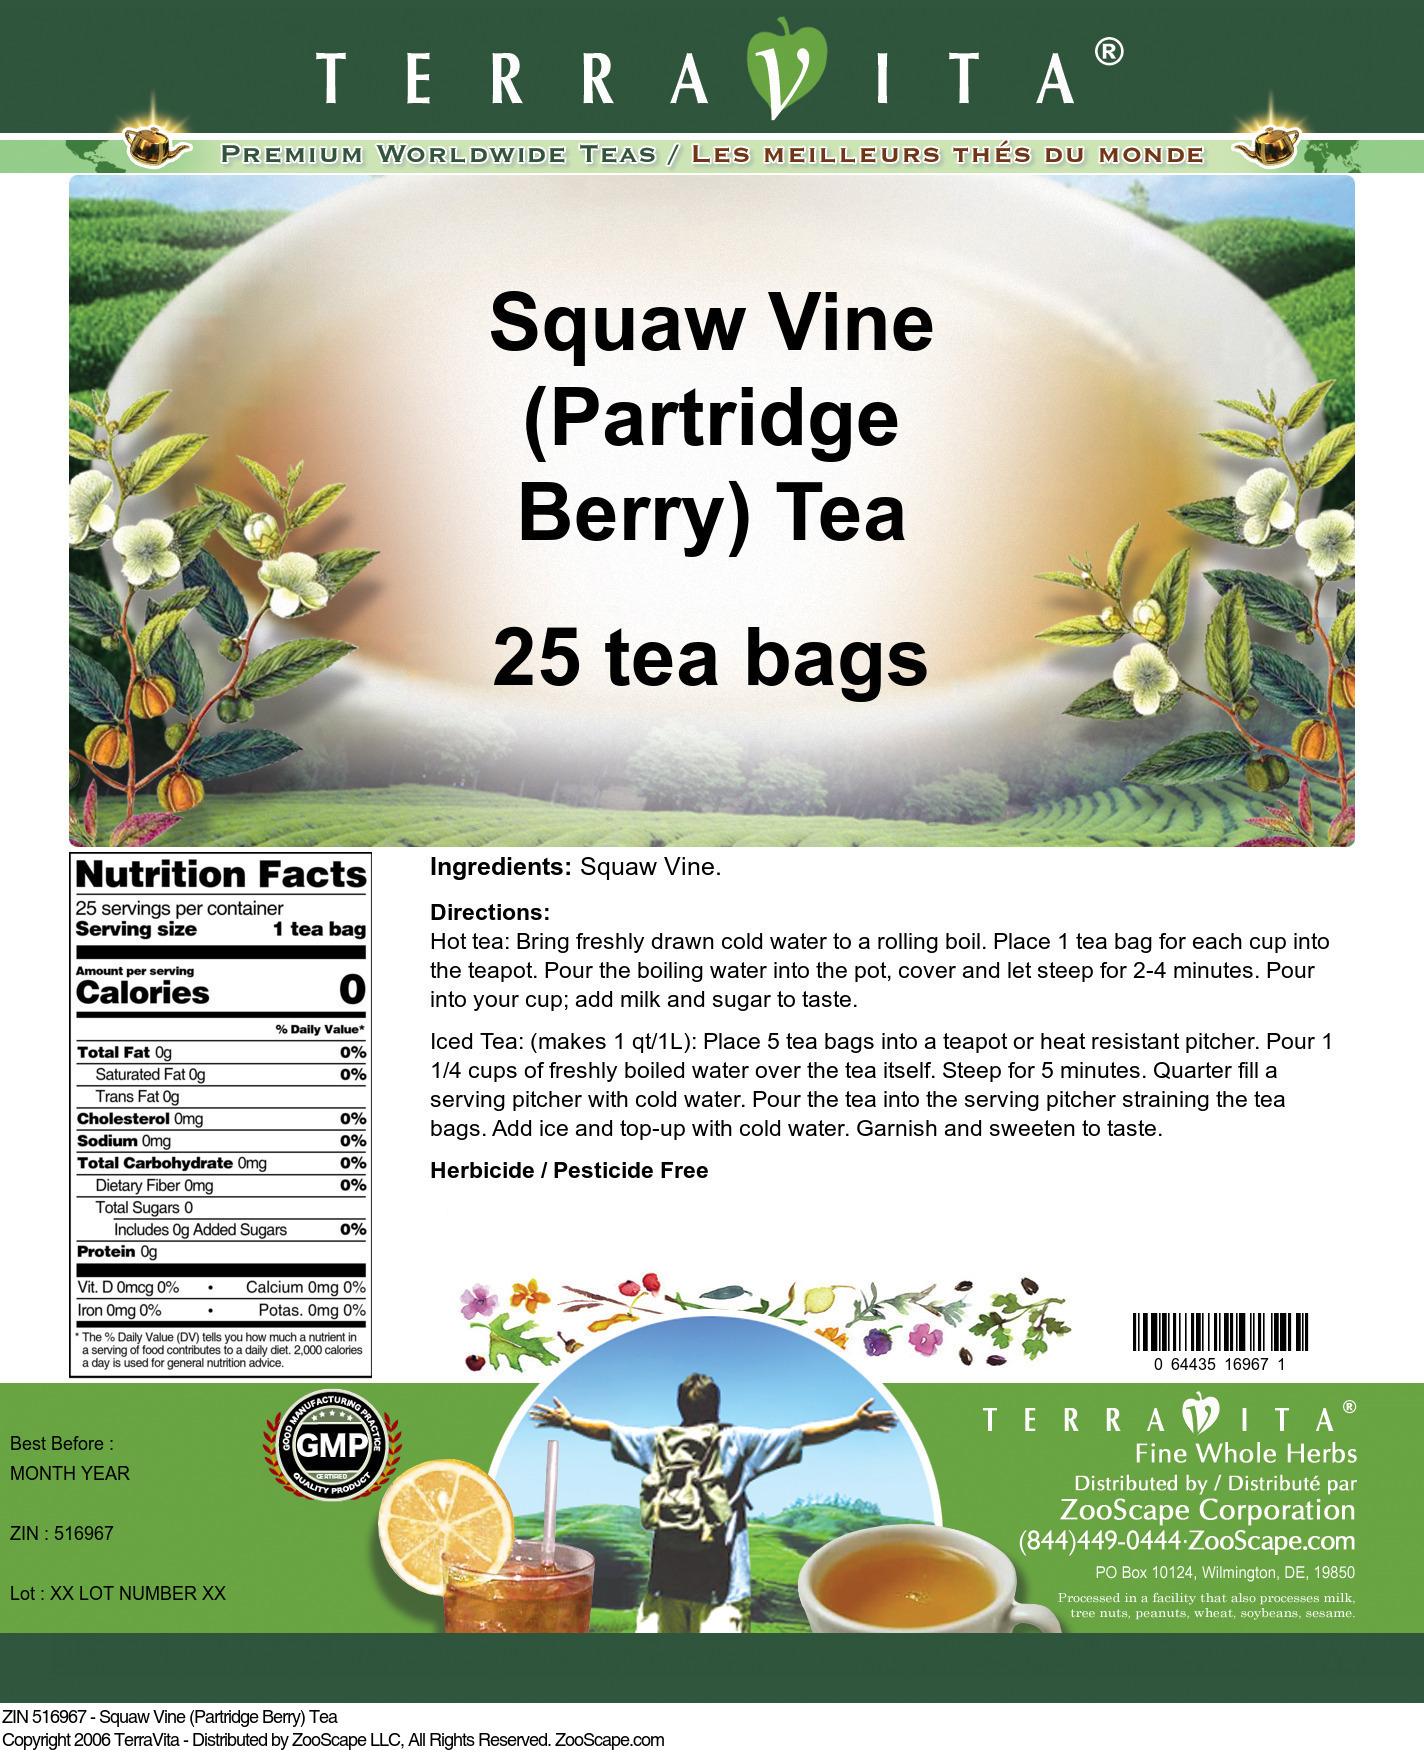 Squaw Vine